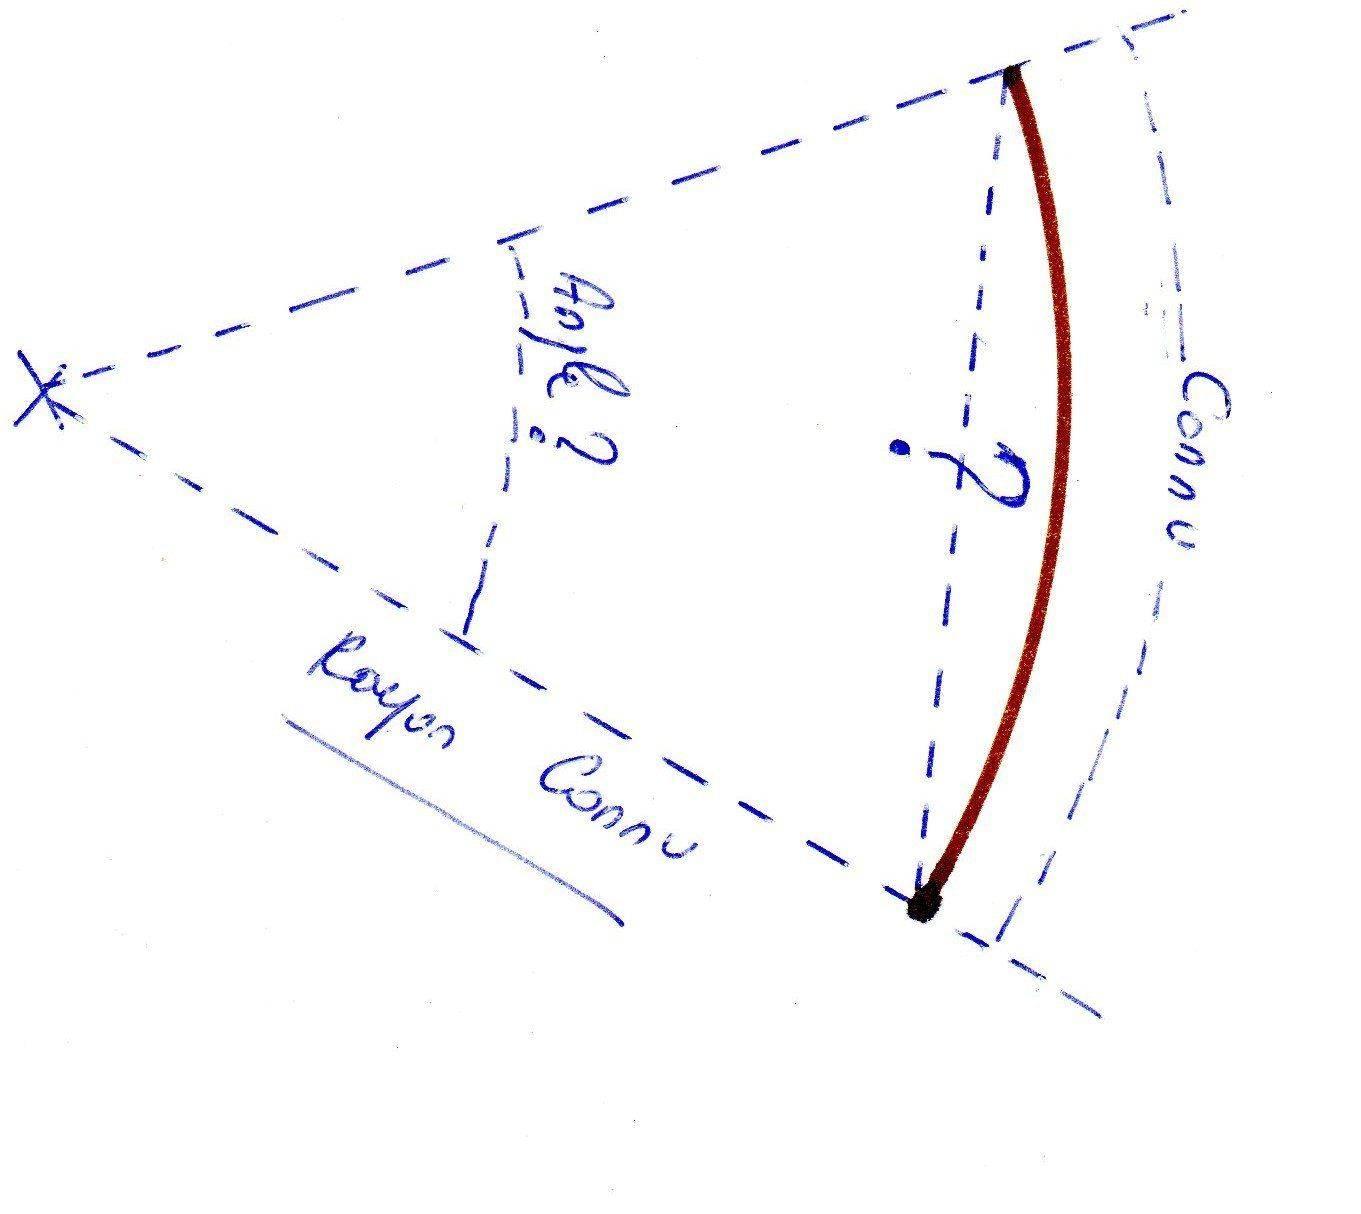 corde arc007 (2).jpg